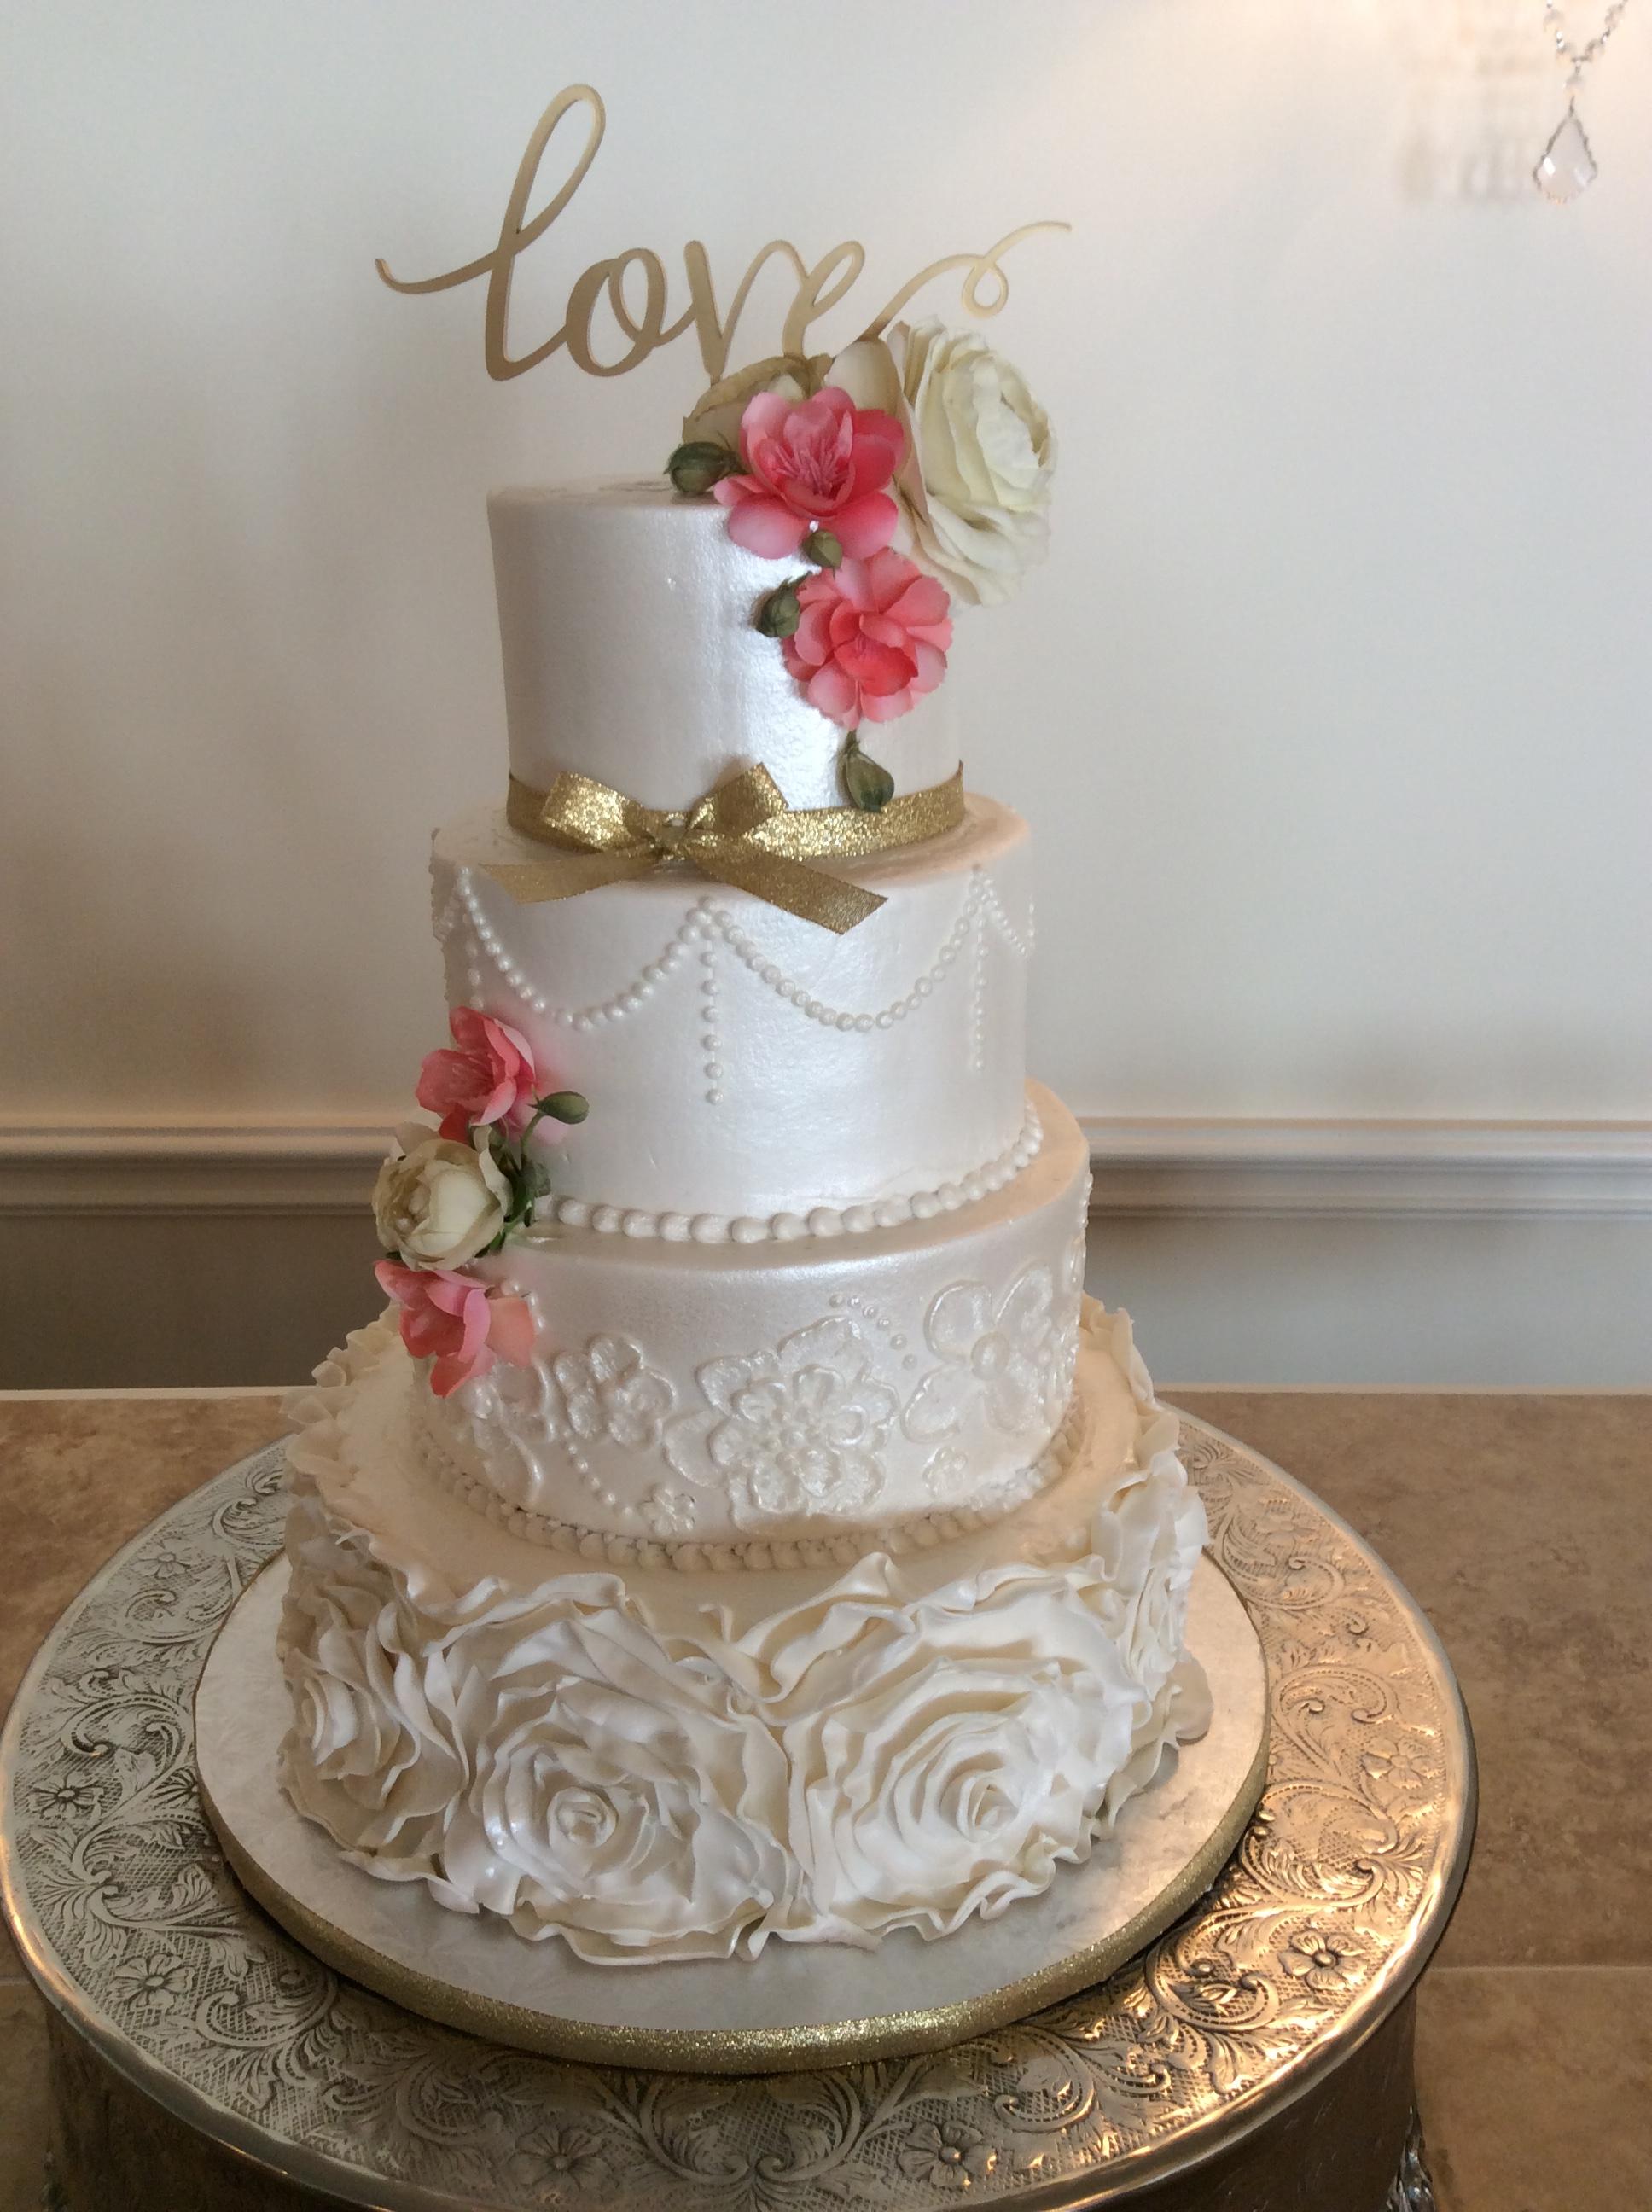 Wedding Cakes by Tammy Allen image 1